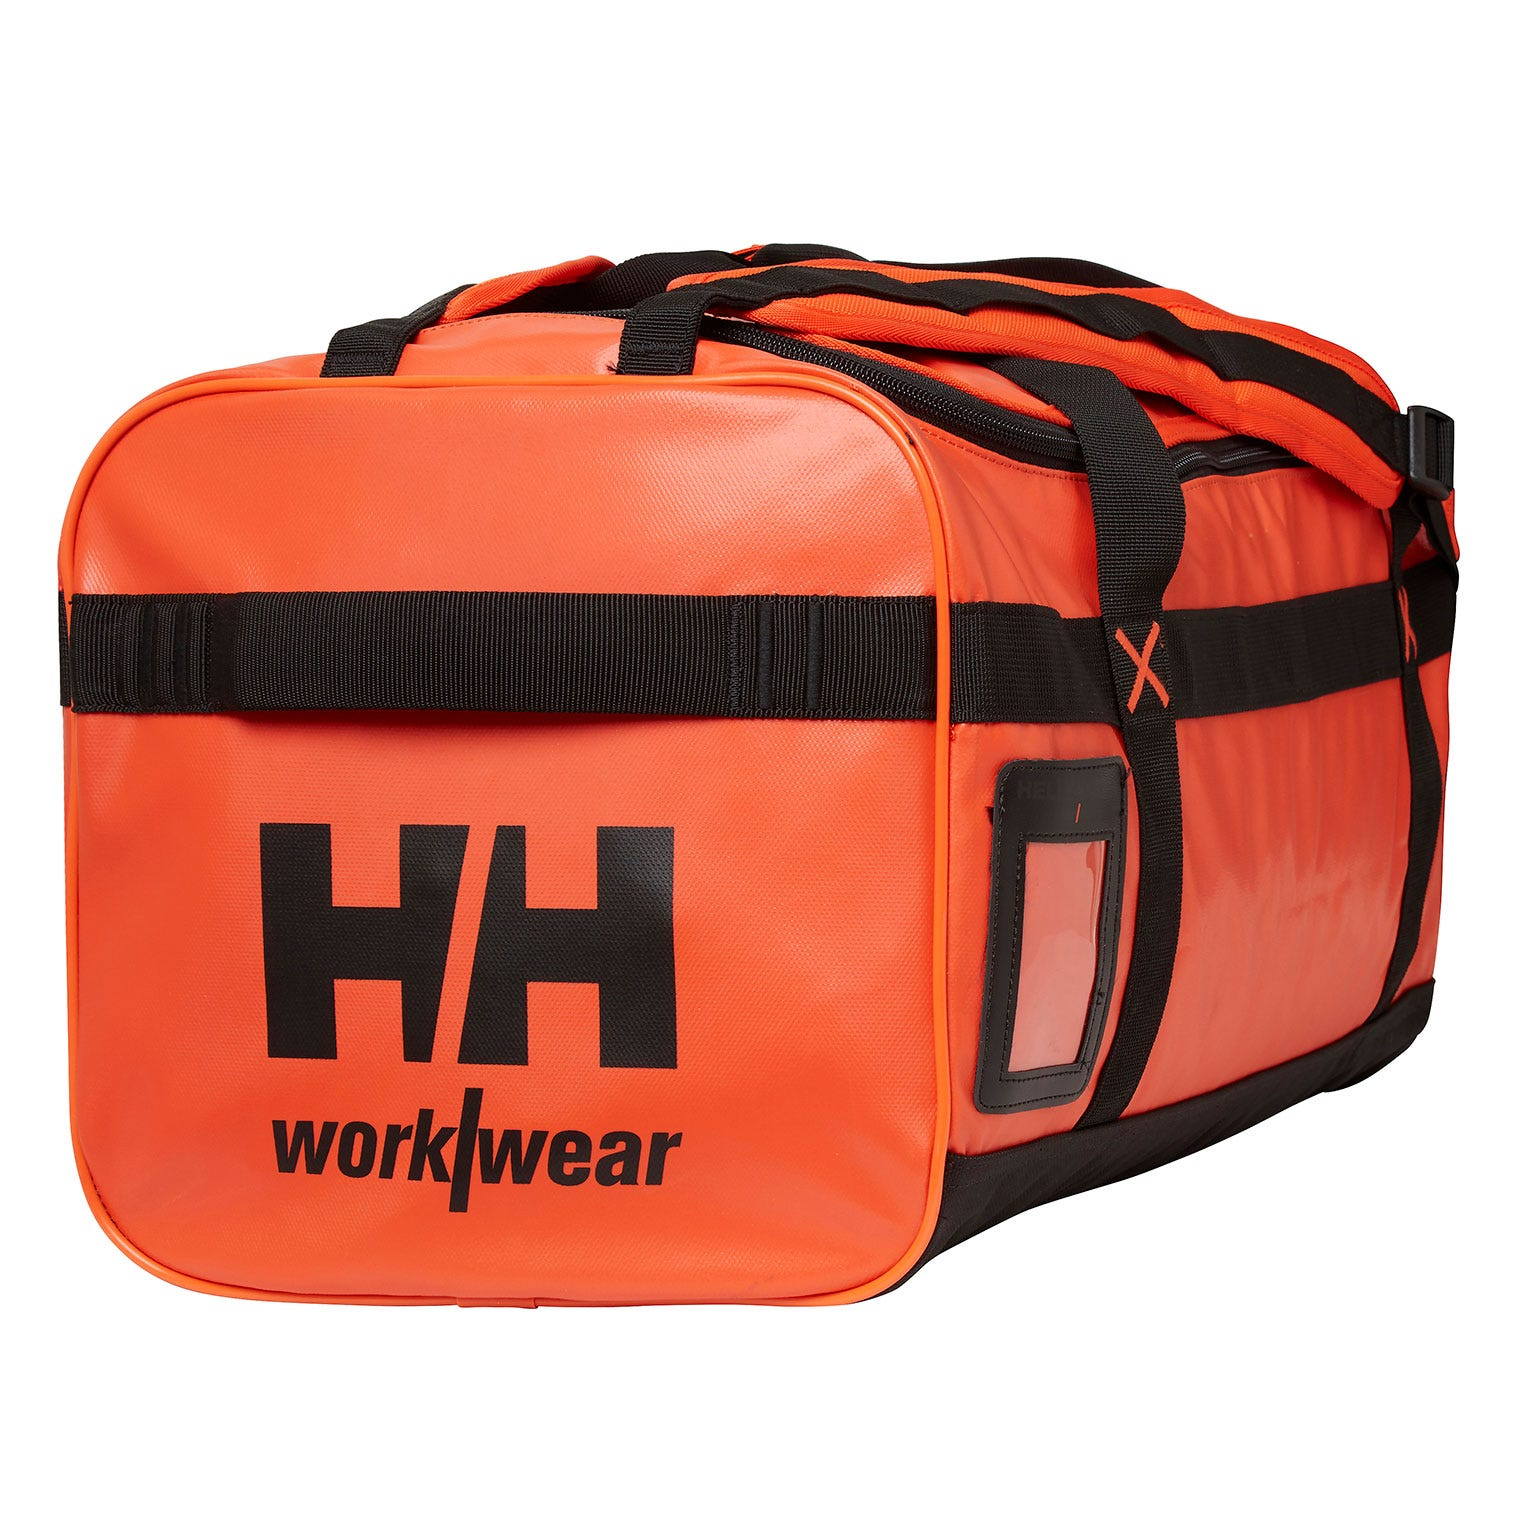 Helly Hansen Tassen Duffel 79572 Inhoud 50 liter donker oranje(299)